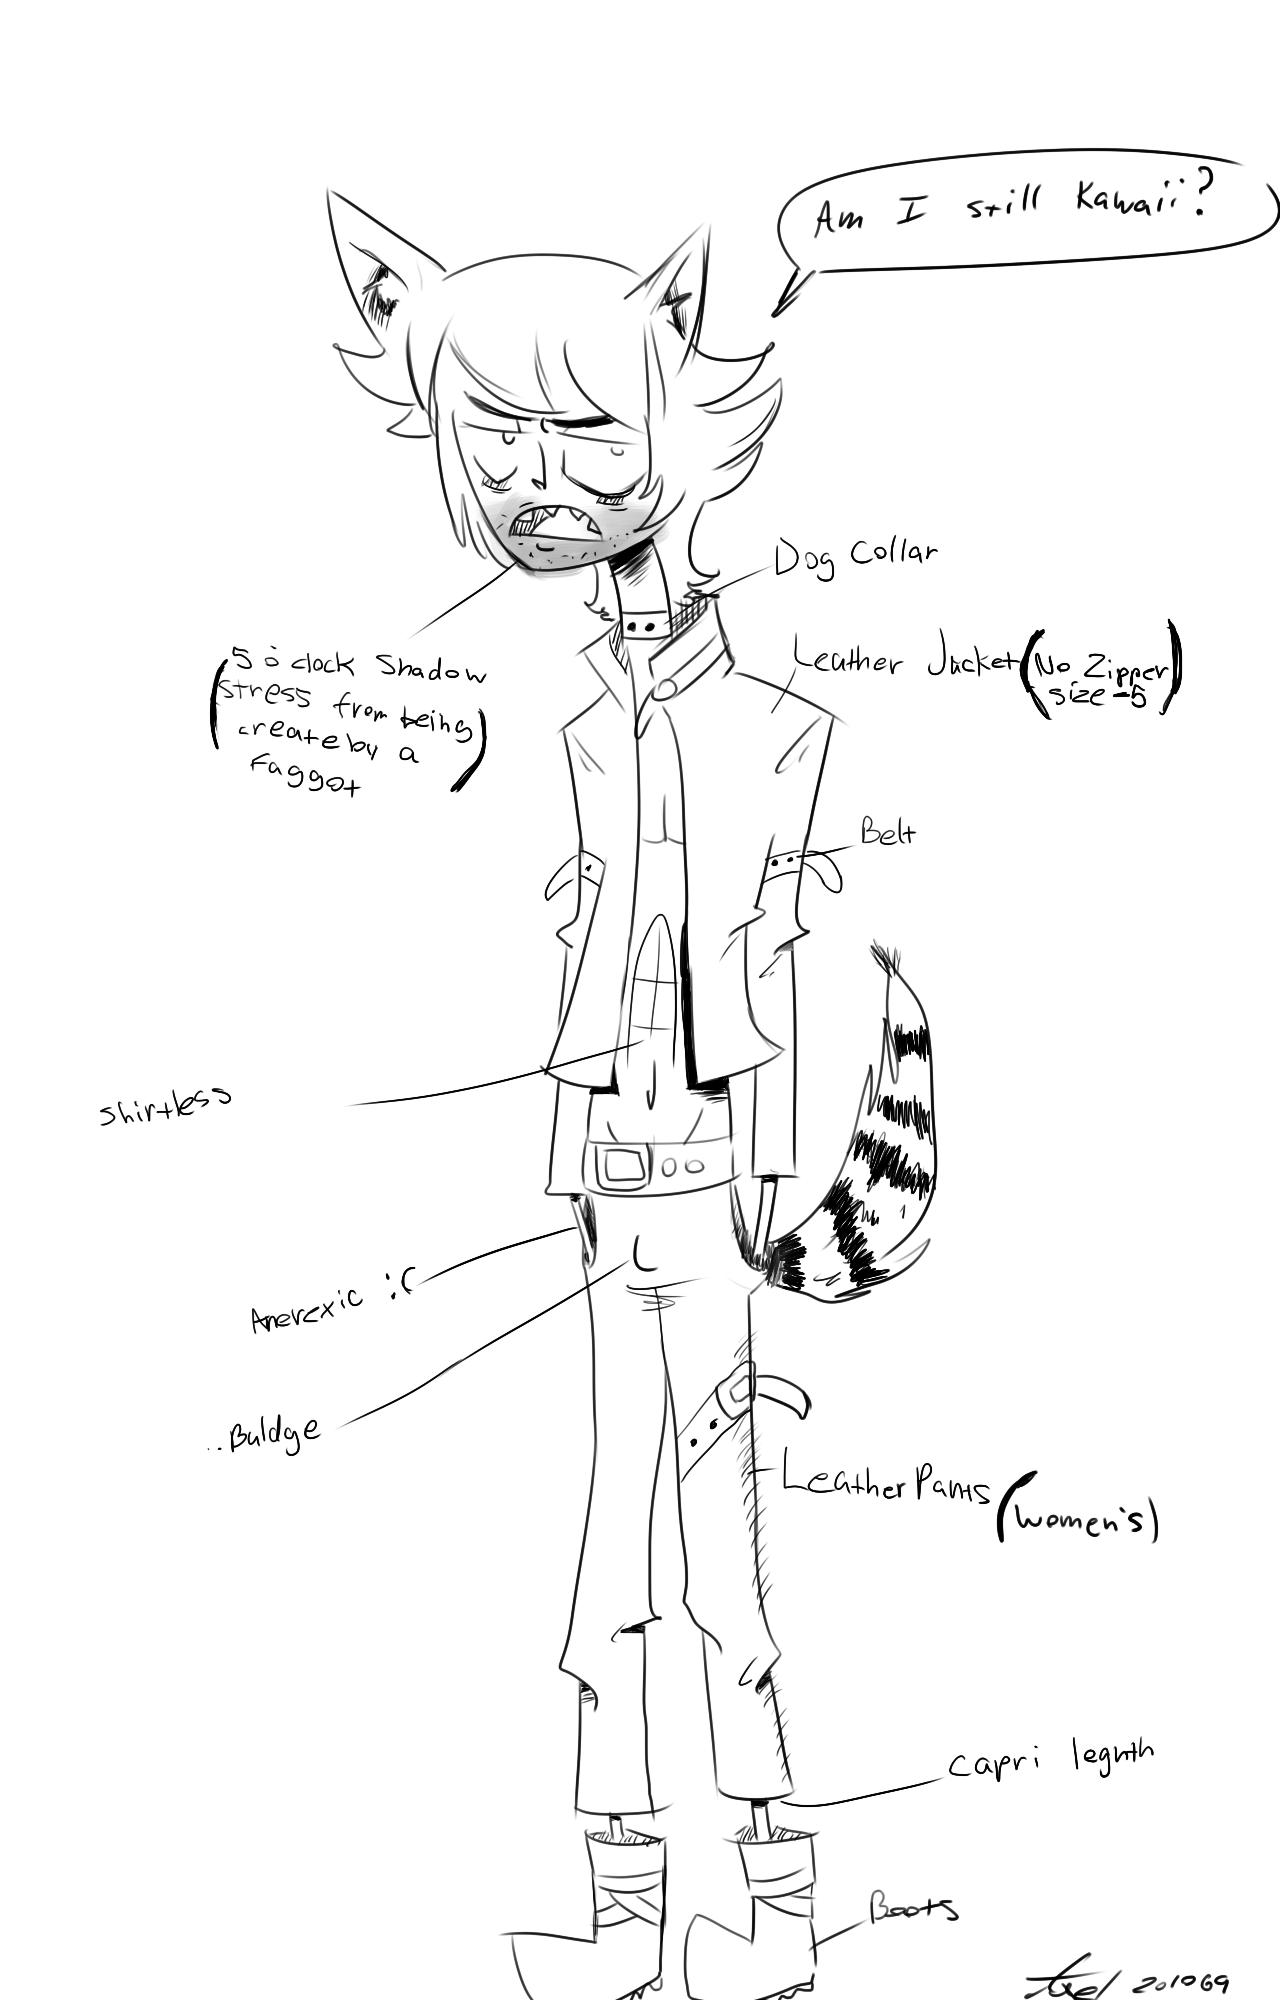 Anatomy Of A Weaboo's Dream